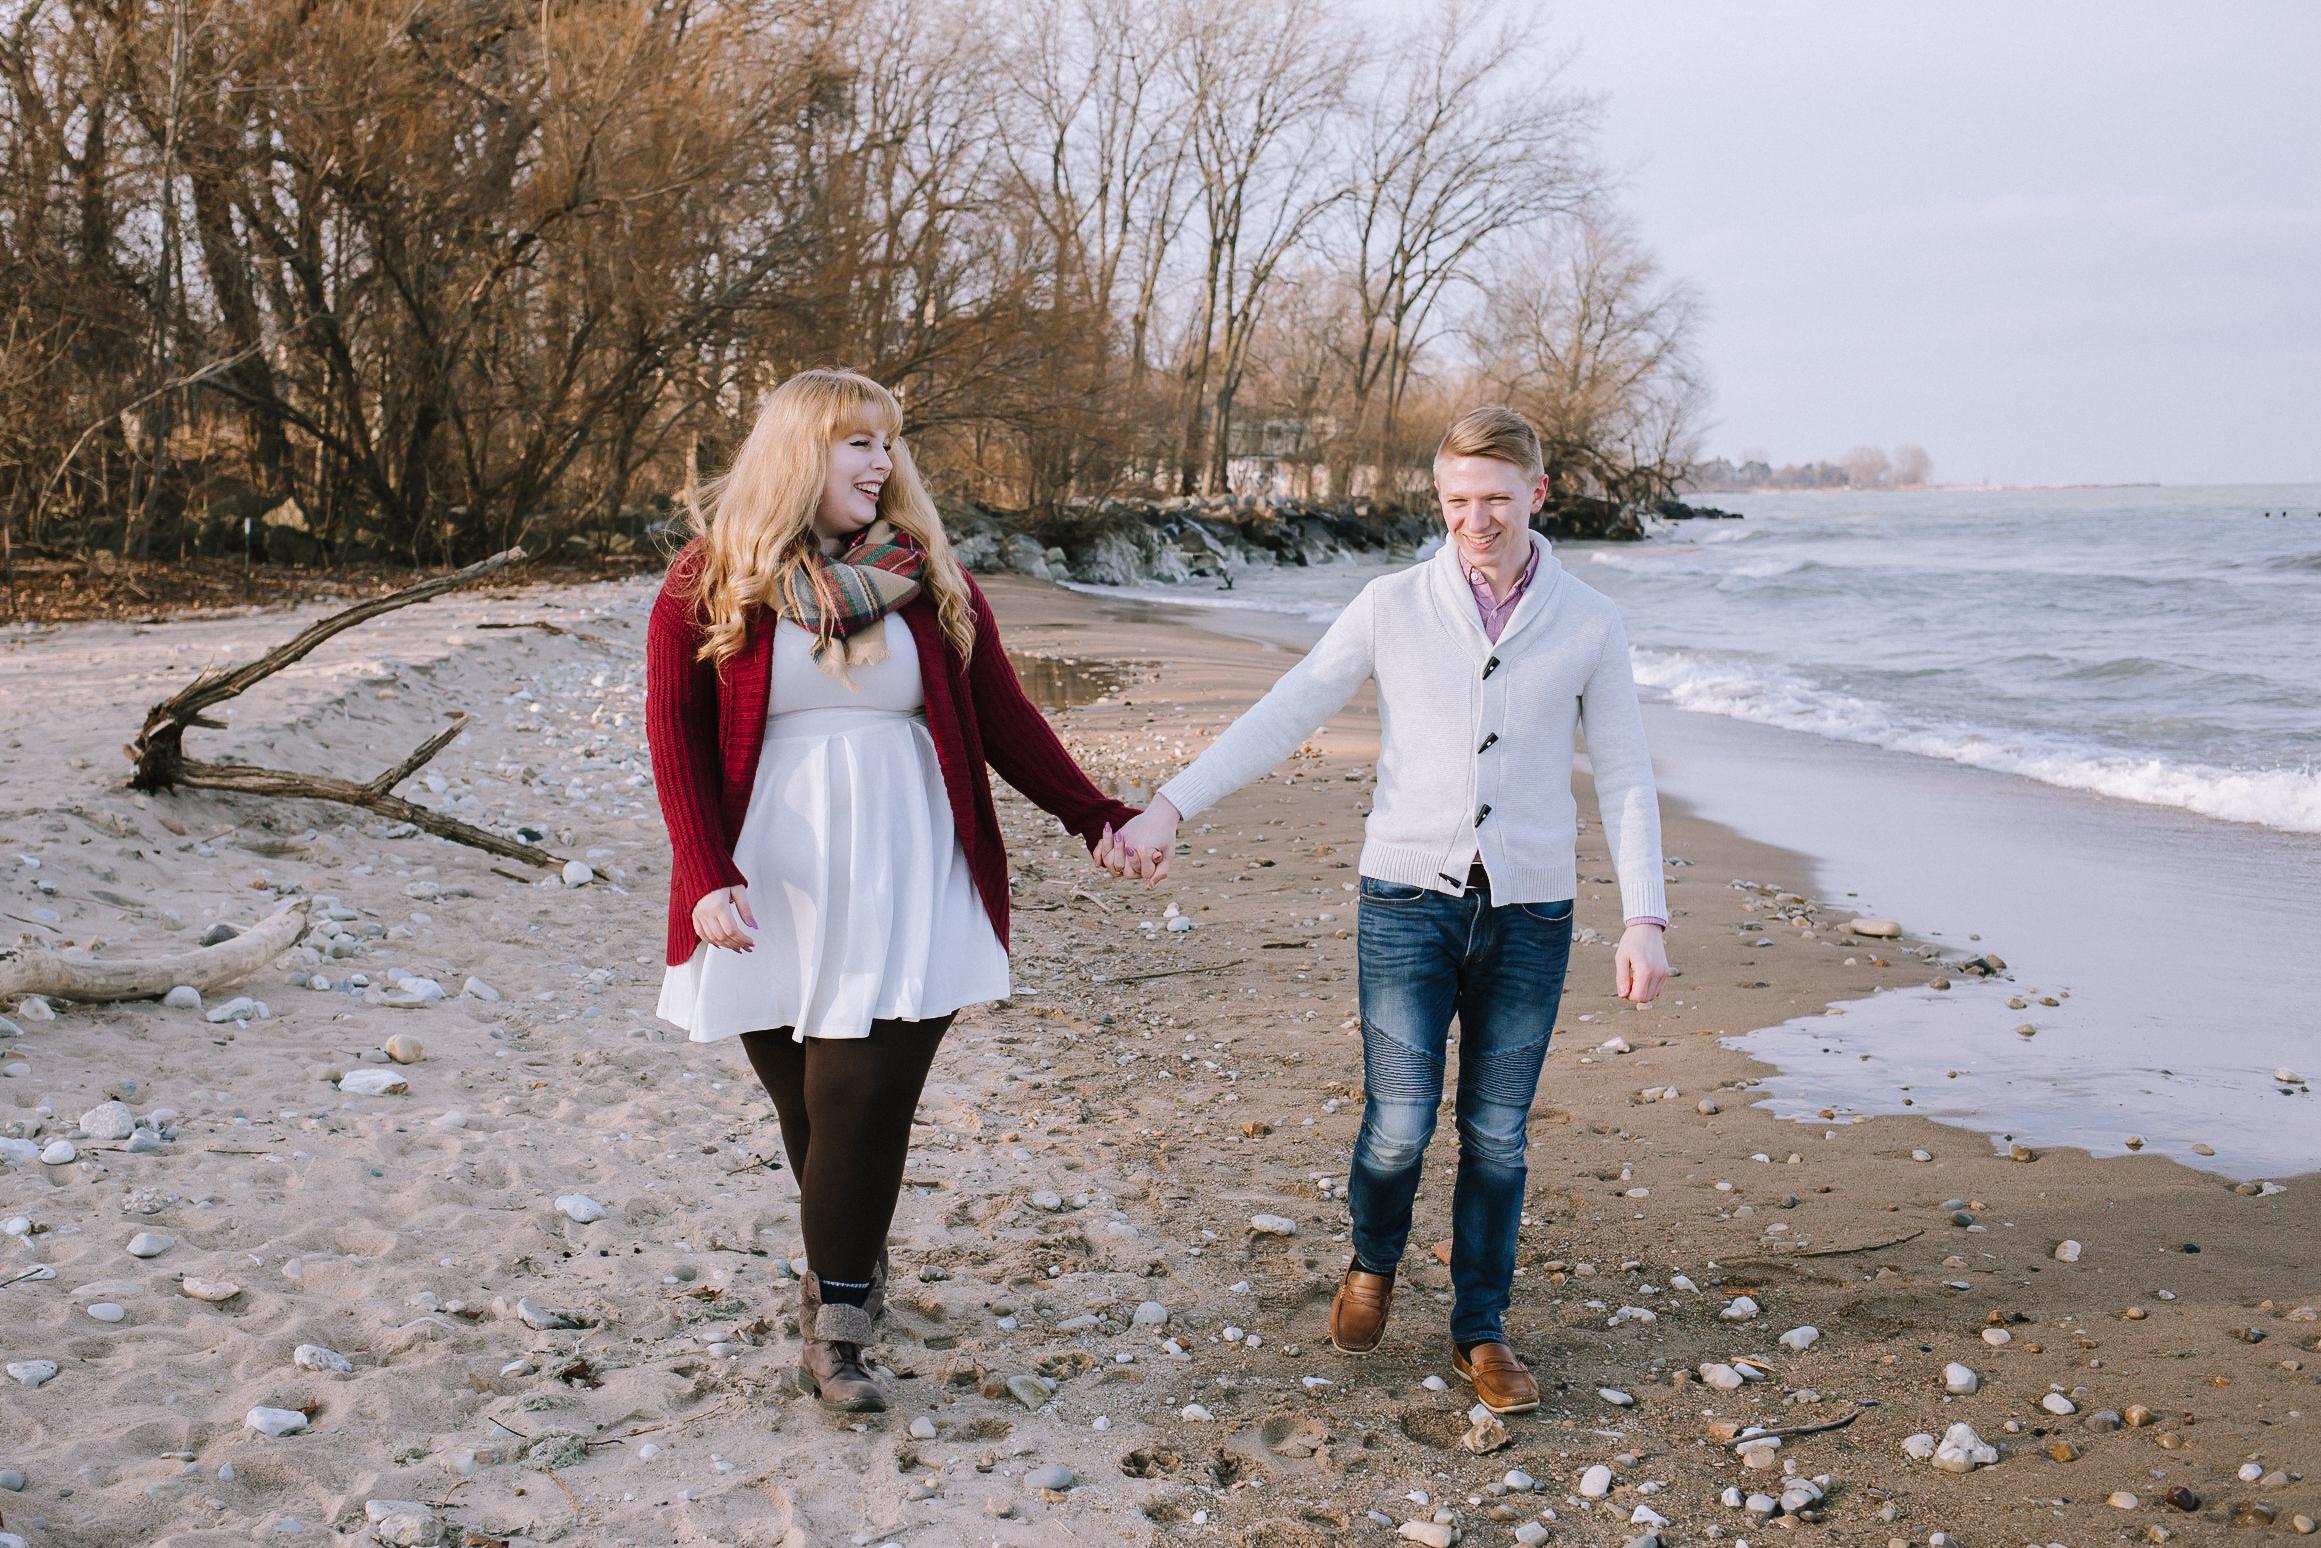 GerdeChicago Lighthouse Engagement, Kaitlin Powell Photography